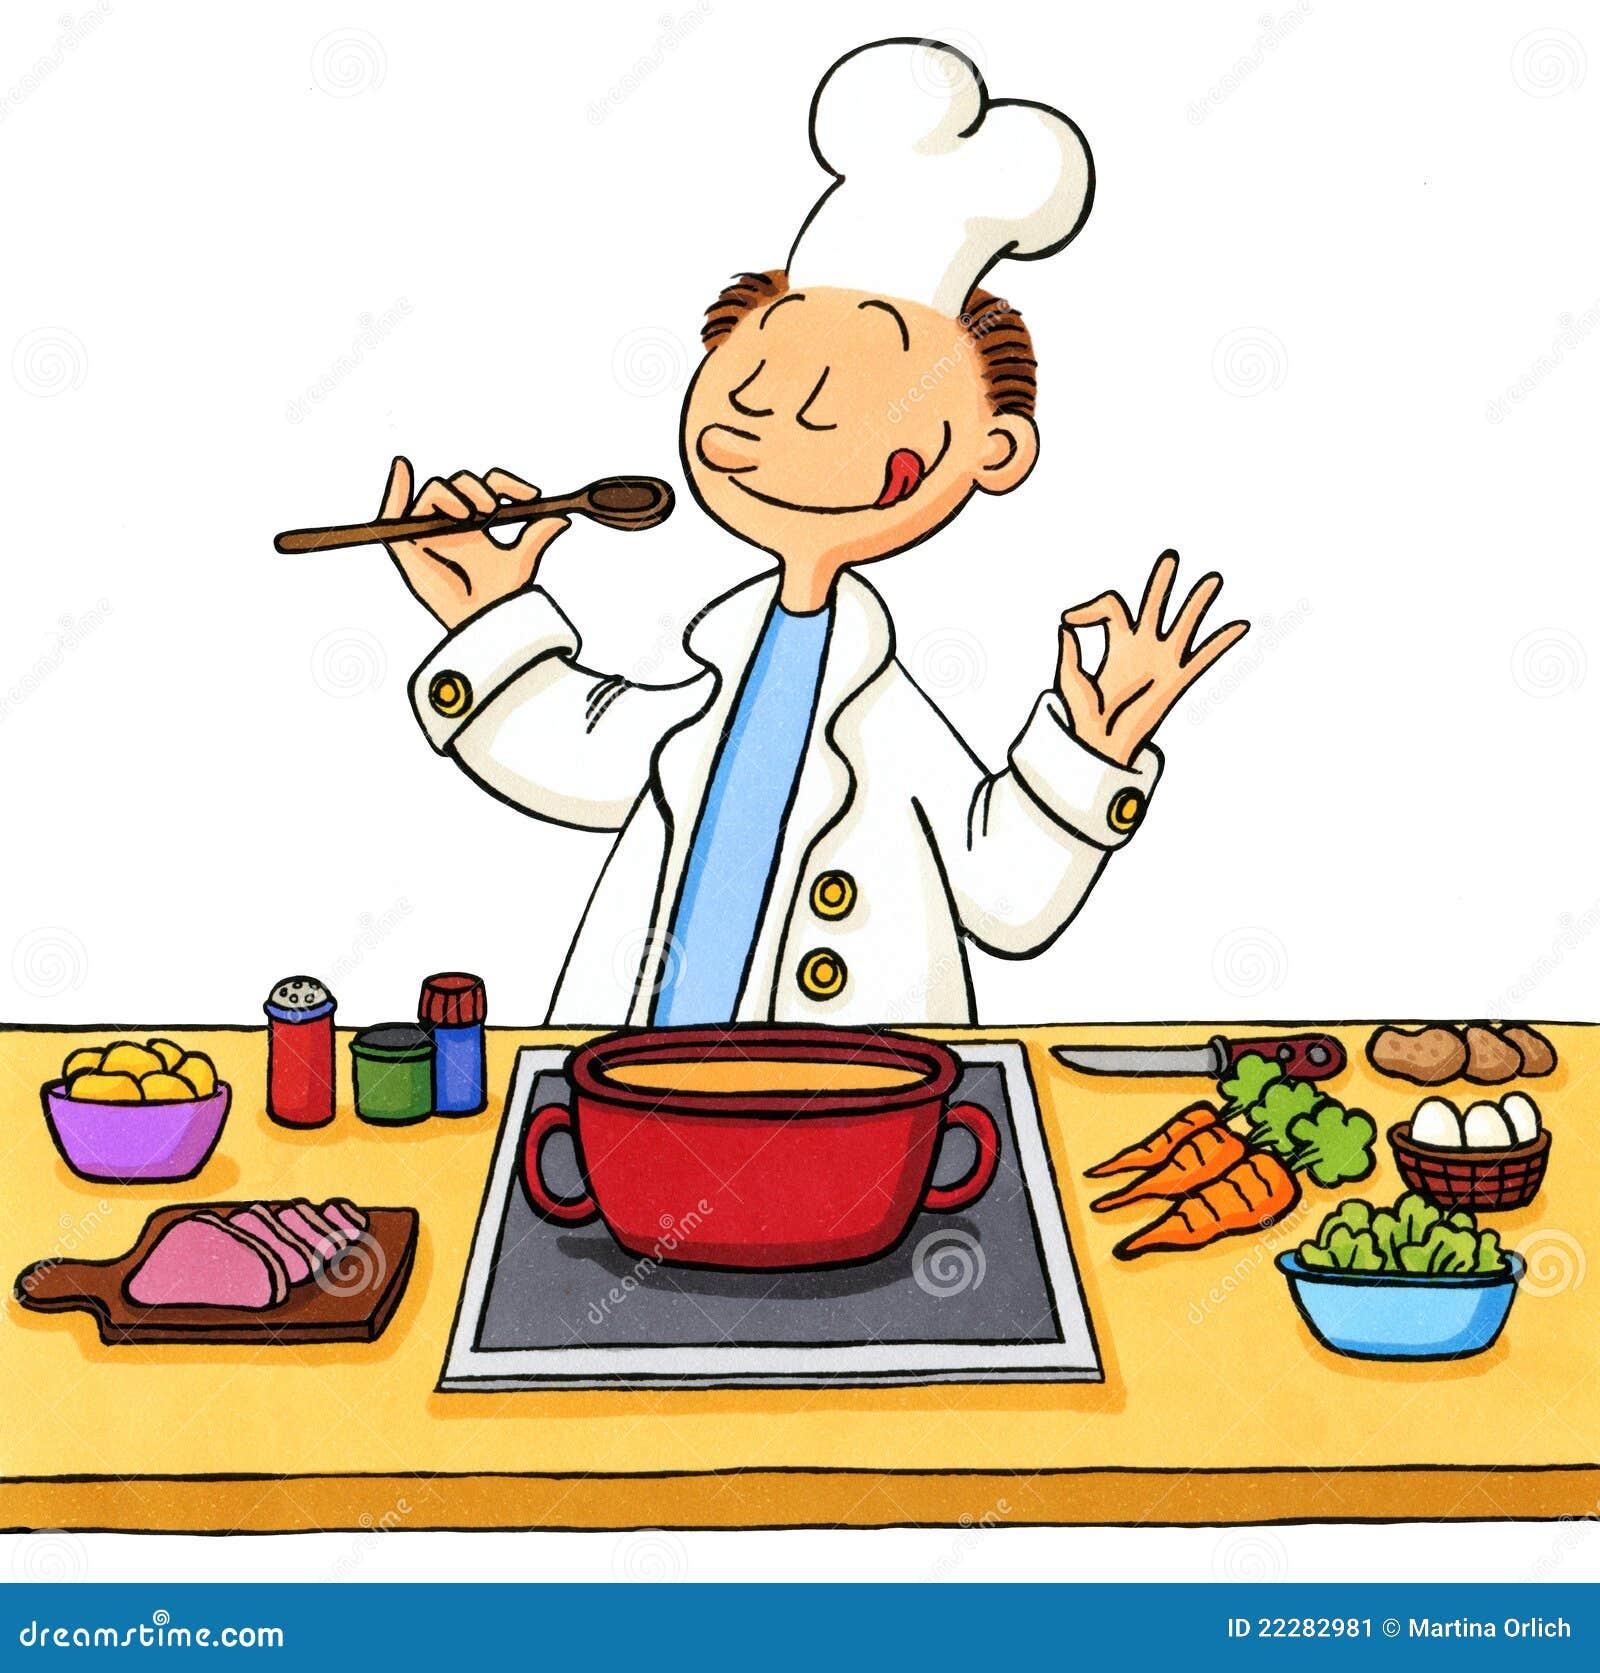 Dessin anim d 39 un cuisinier dans la cuisine illustration for Cuisinier humour